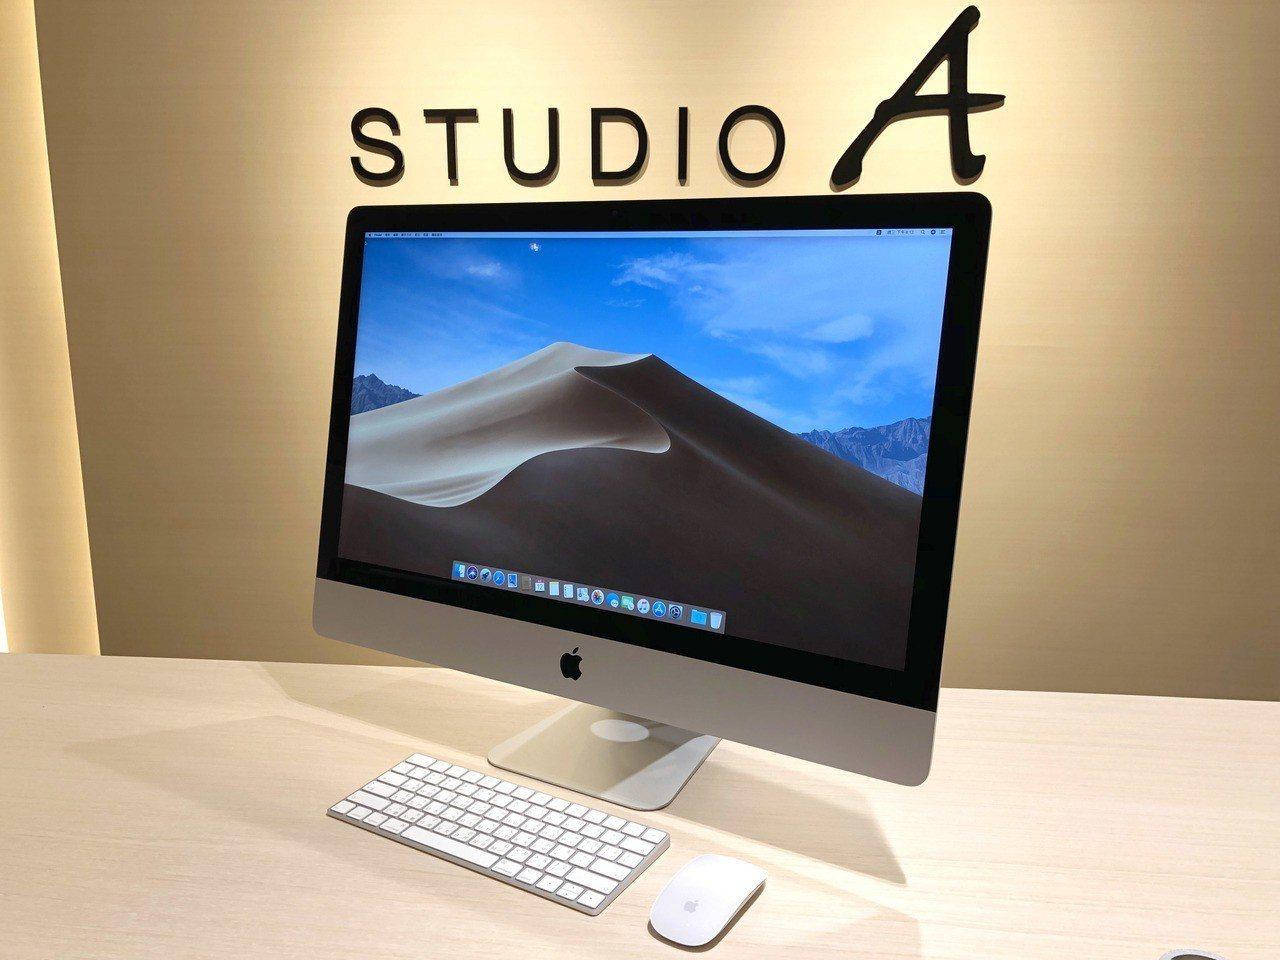 STUDIO A台中豐原太平洋門市6月14日開幕,iMAC 27吋1TB福利機原...